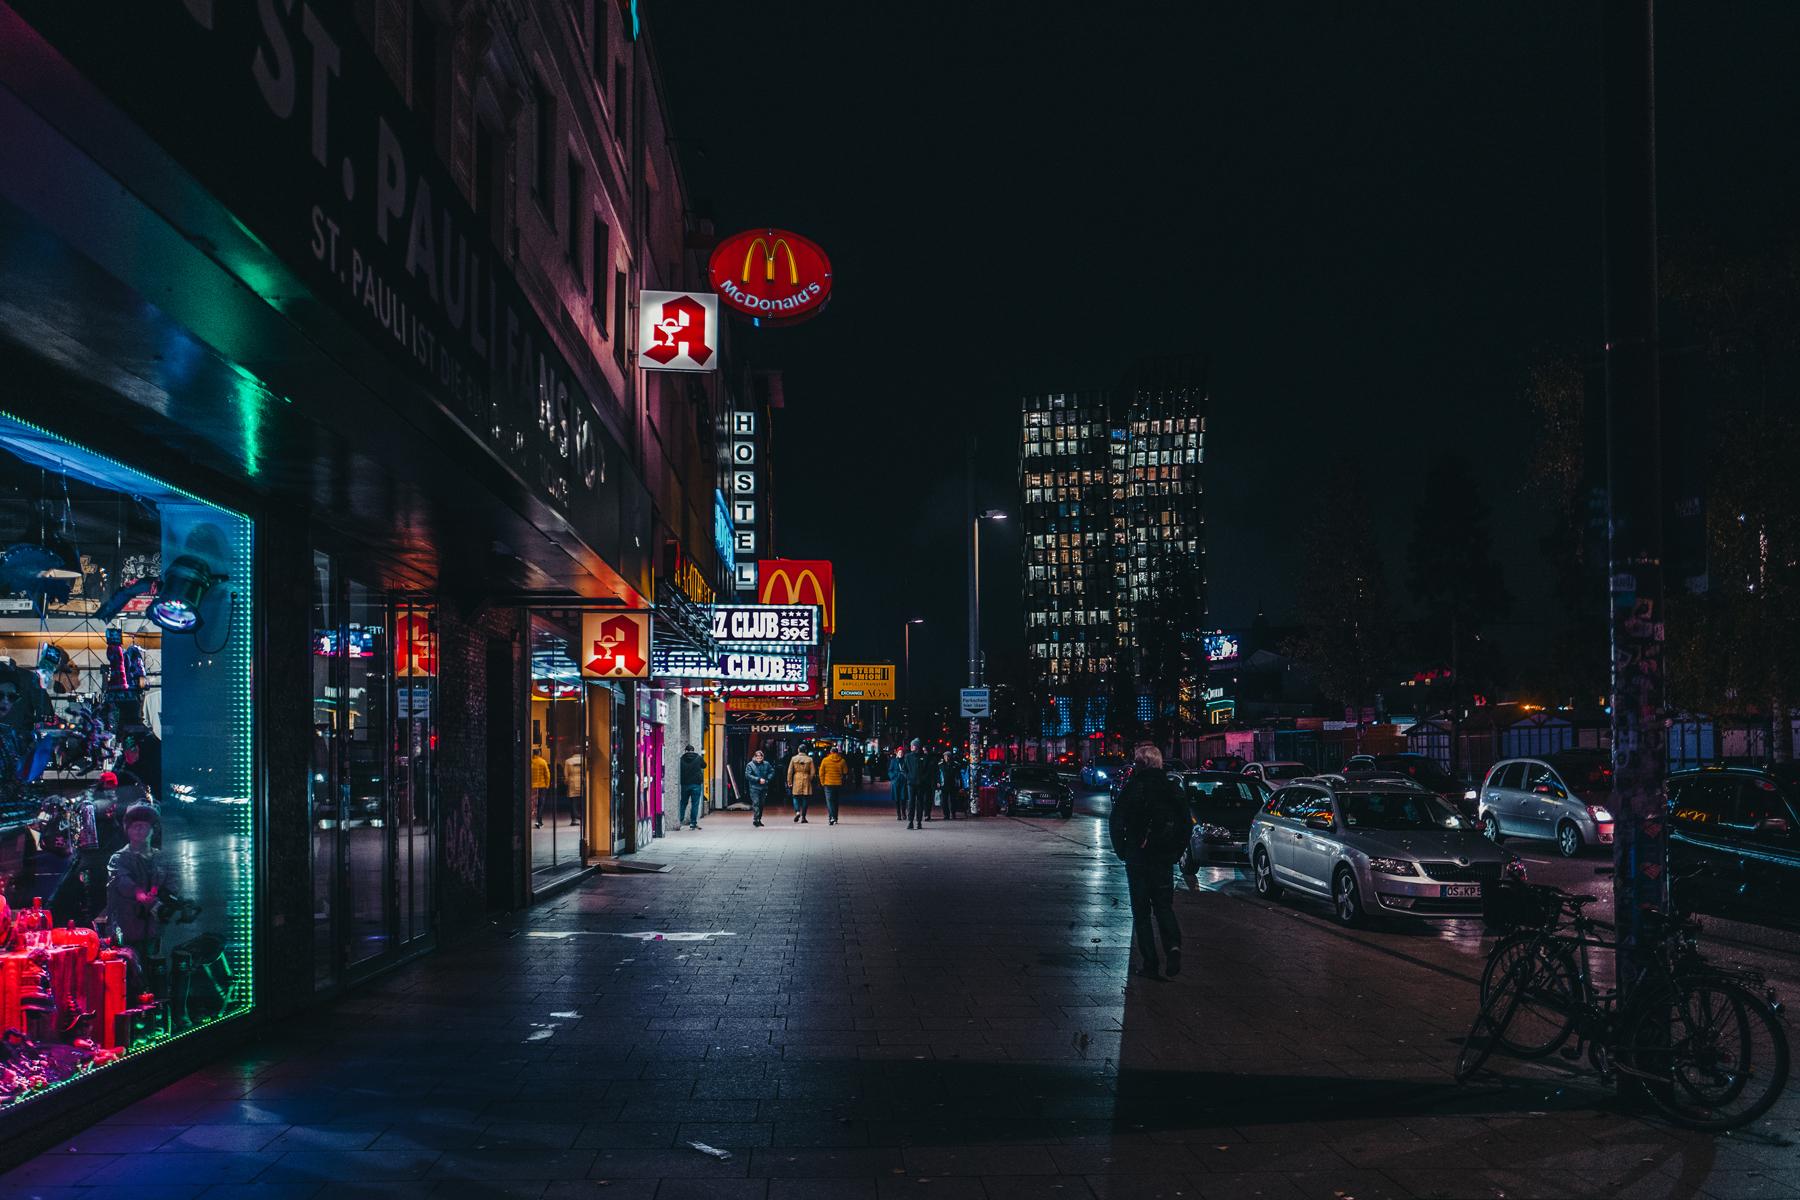 Geheimtipp Hamburg Stadtteile St Pauli